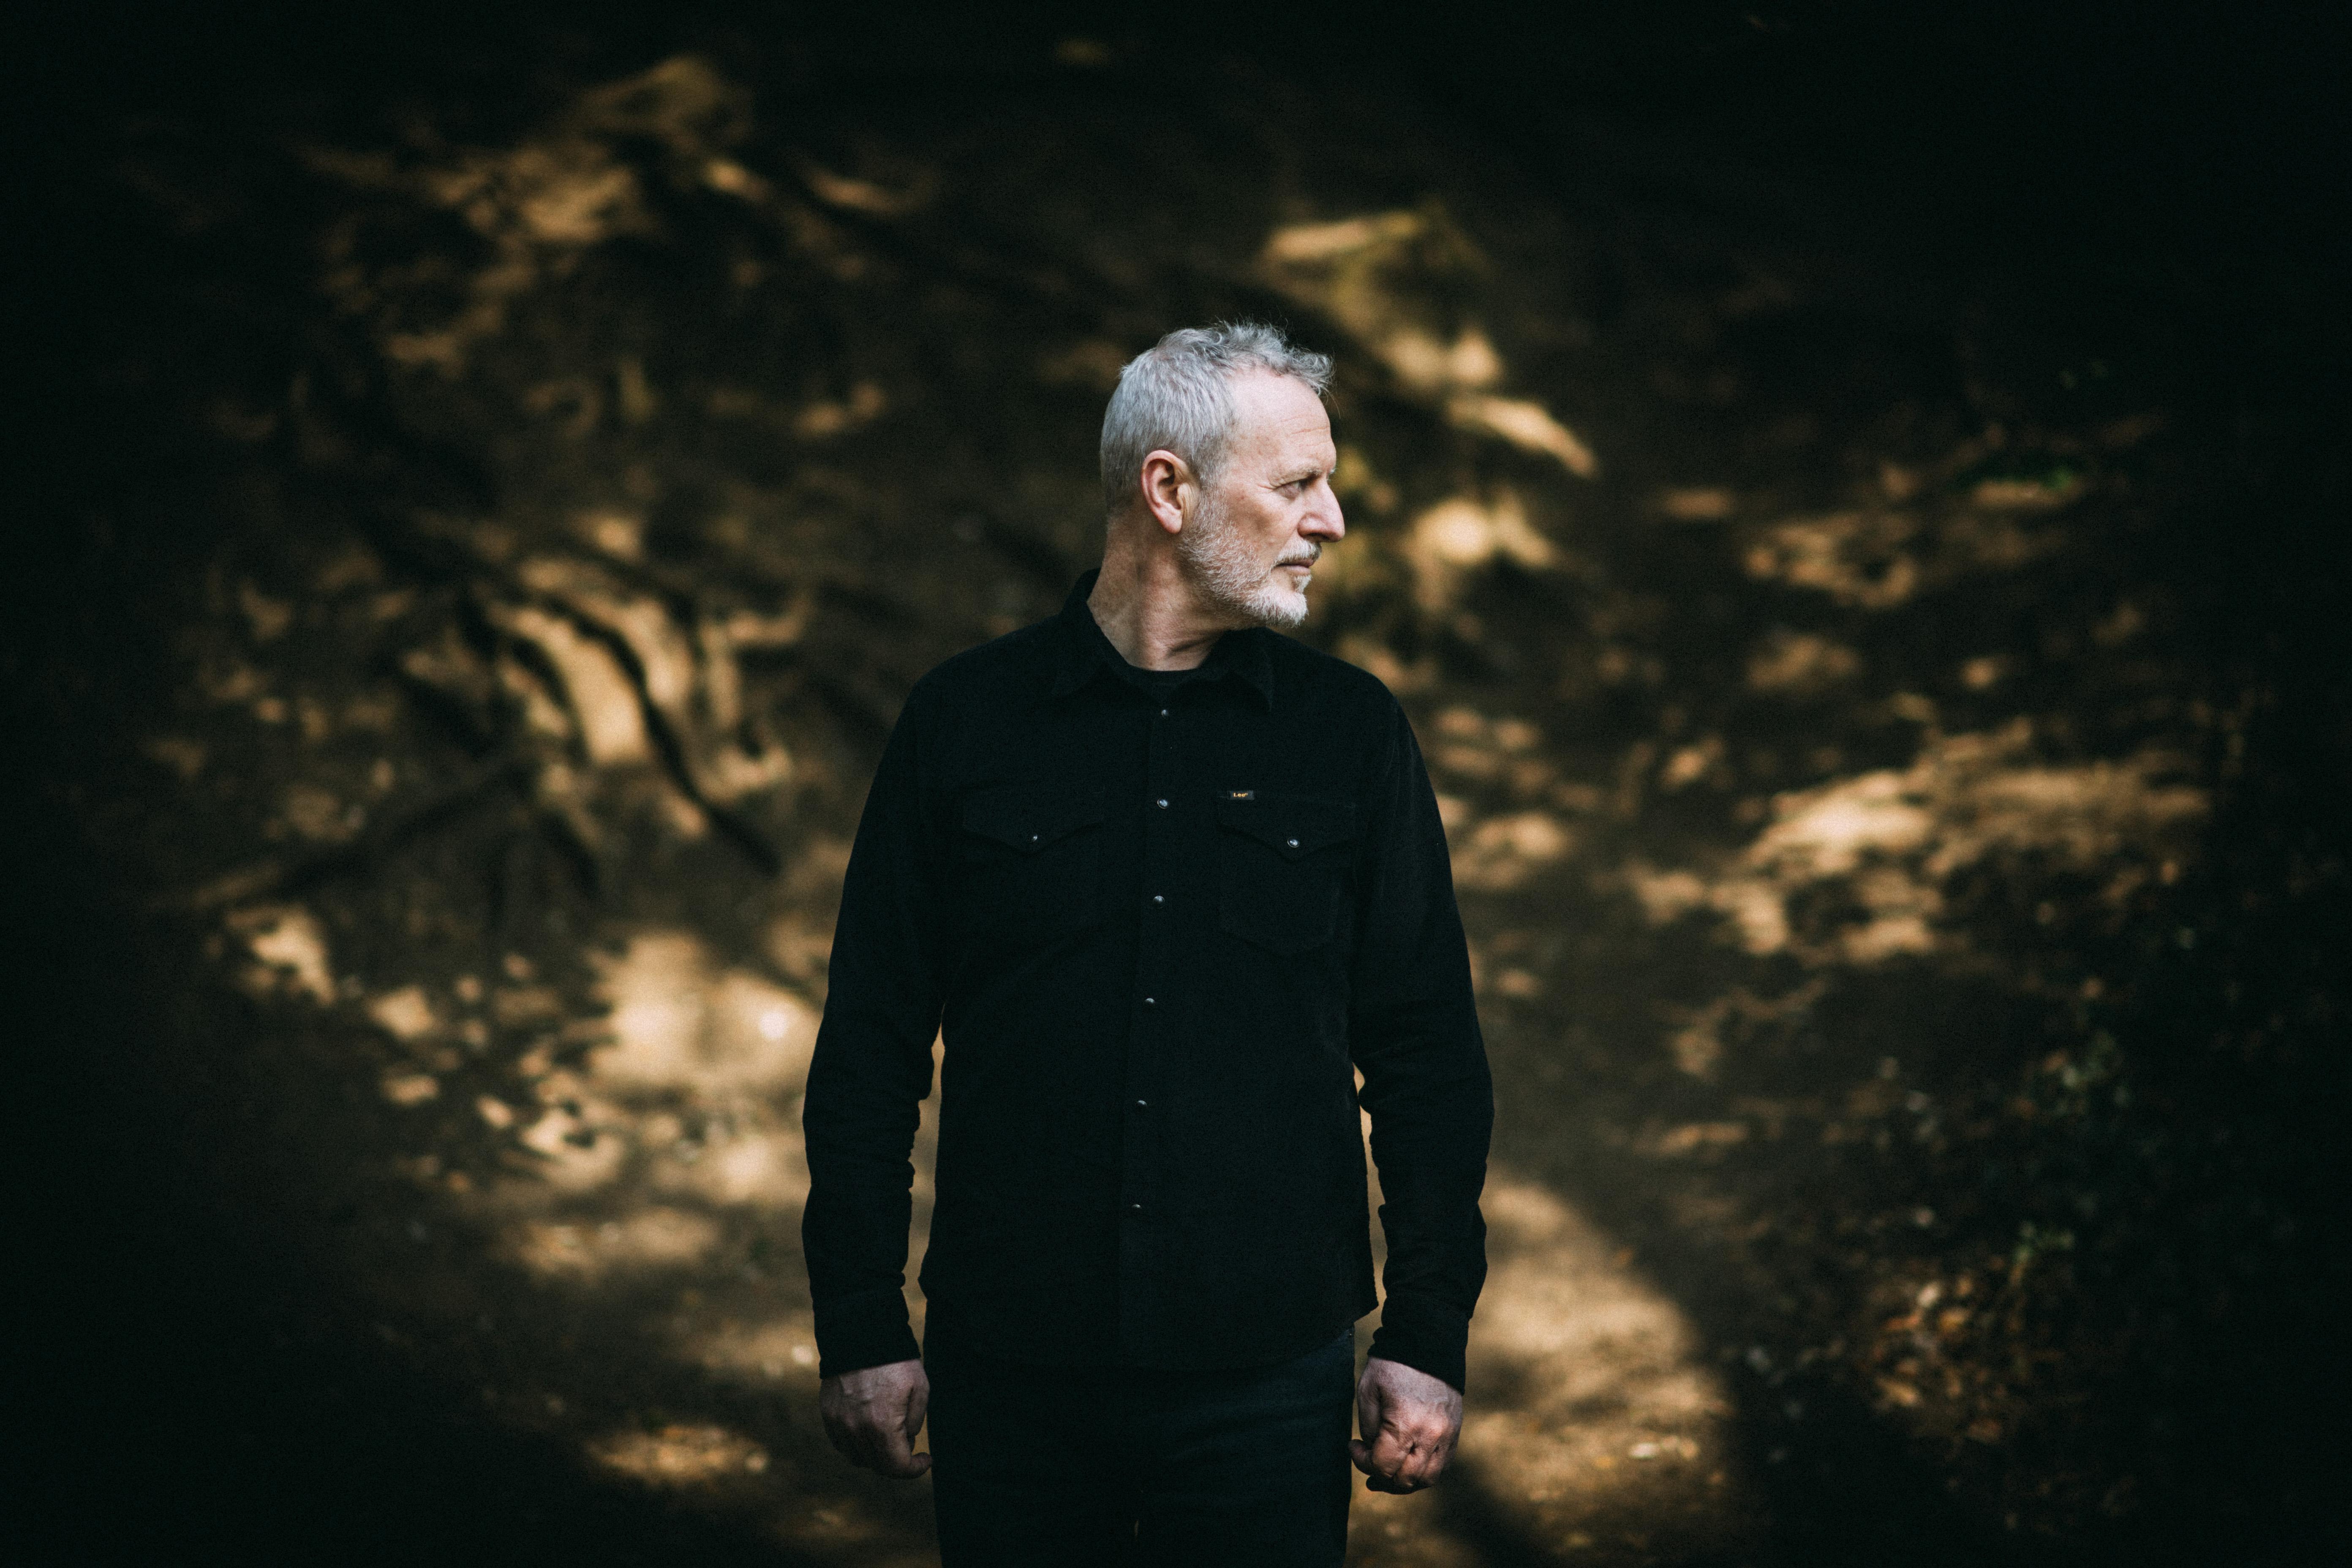 Brendan Tallon - photo by Ruth Medjber